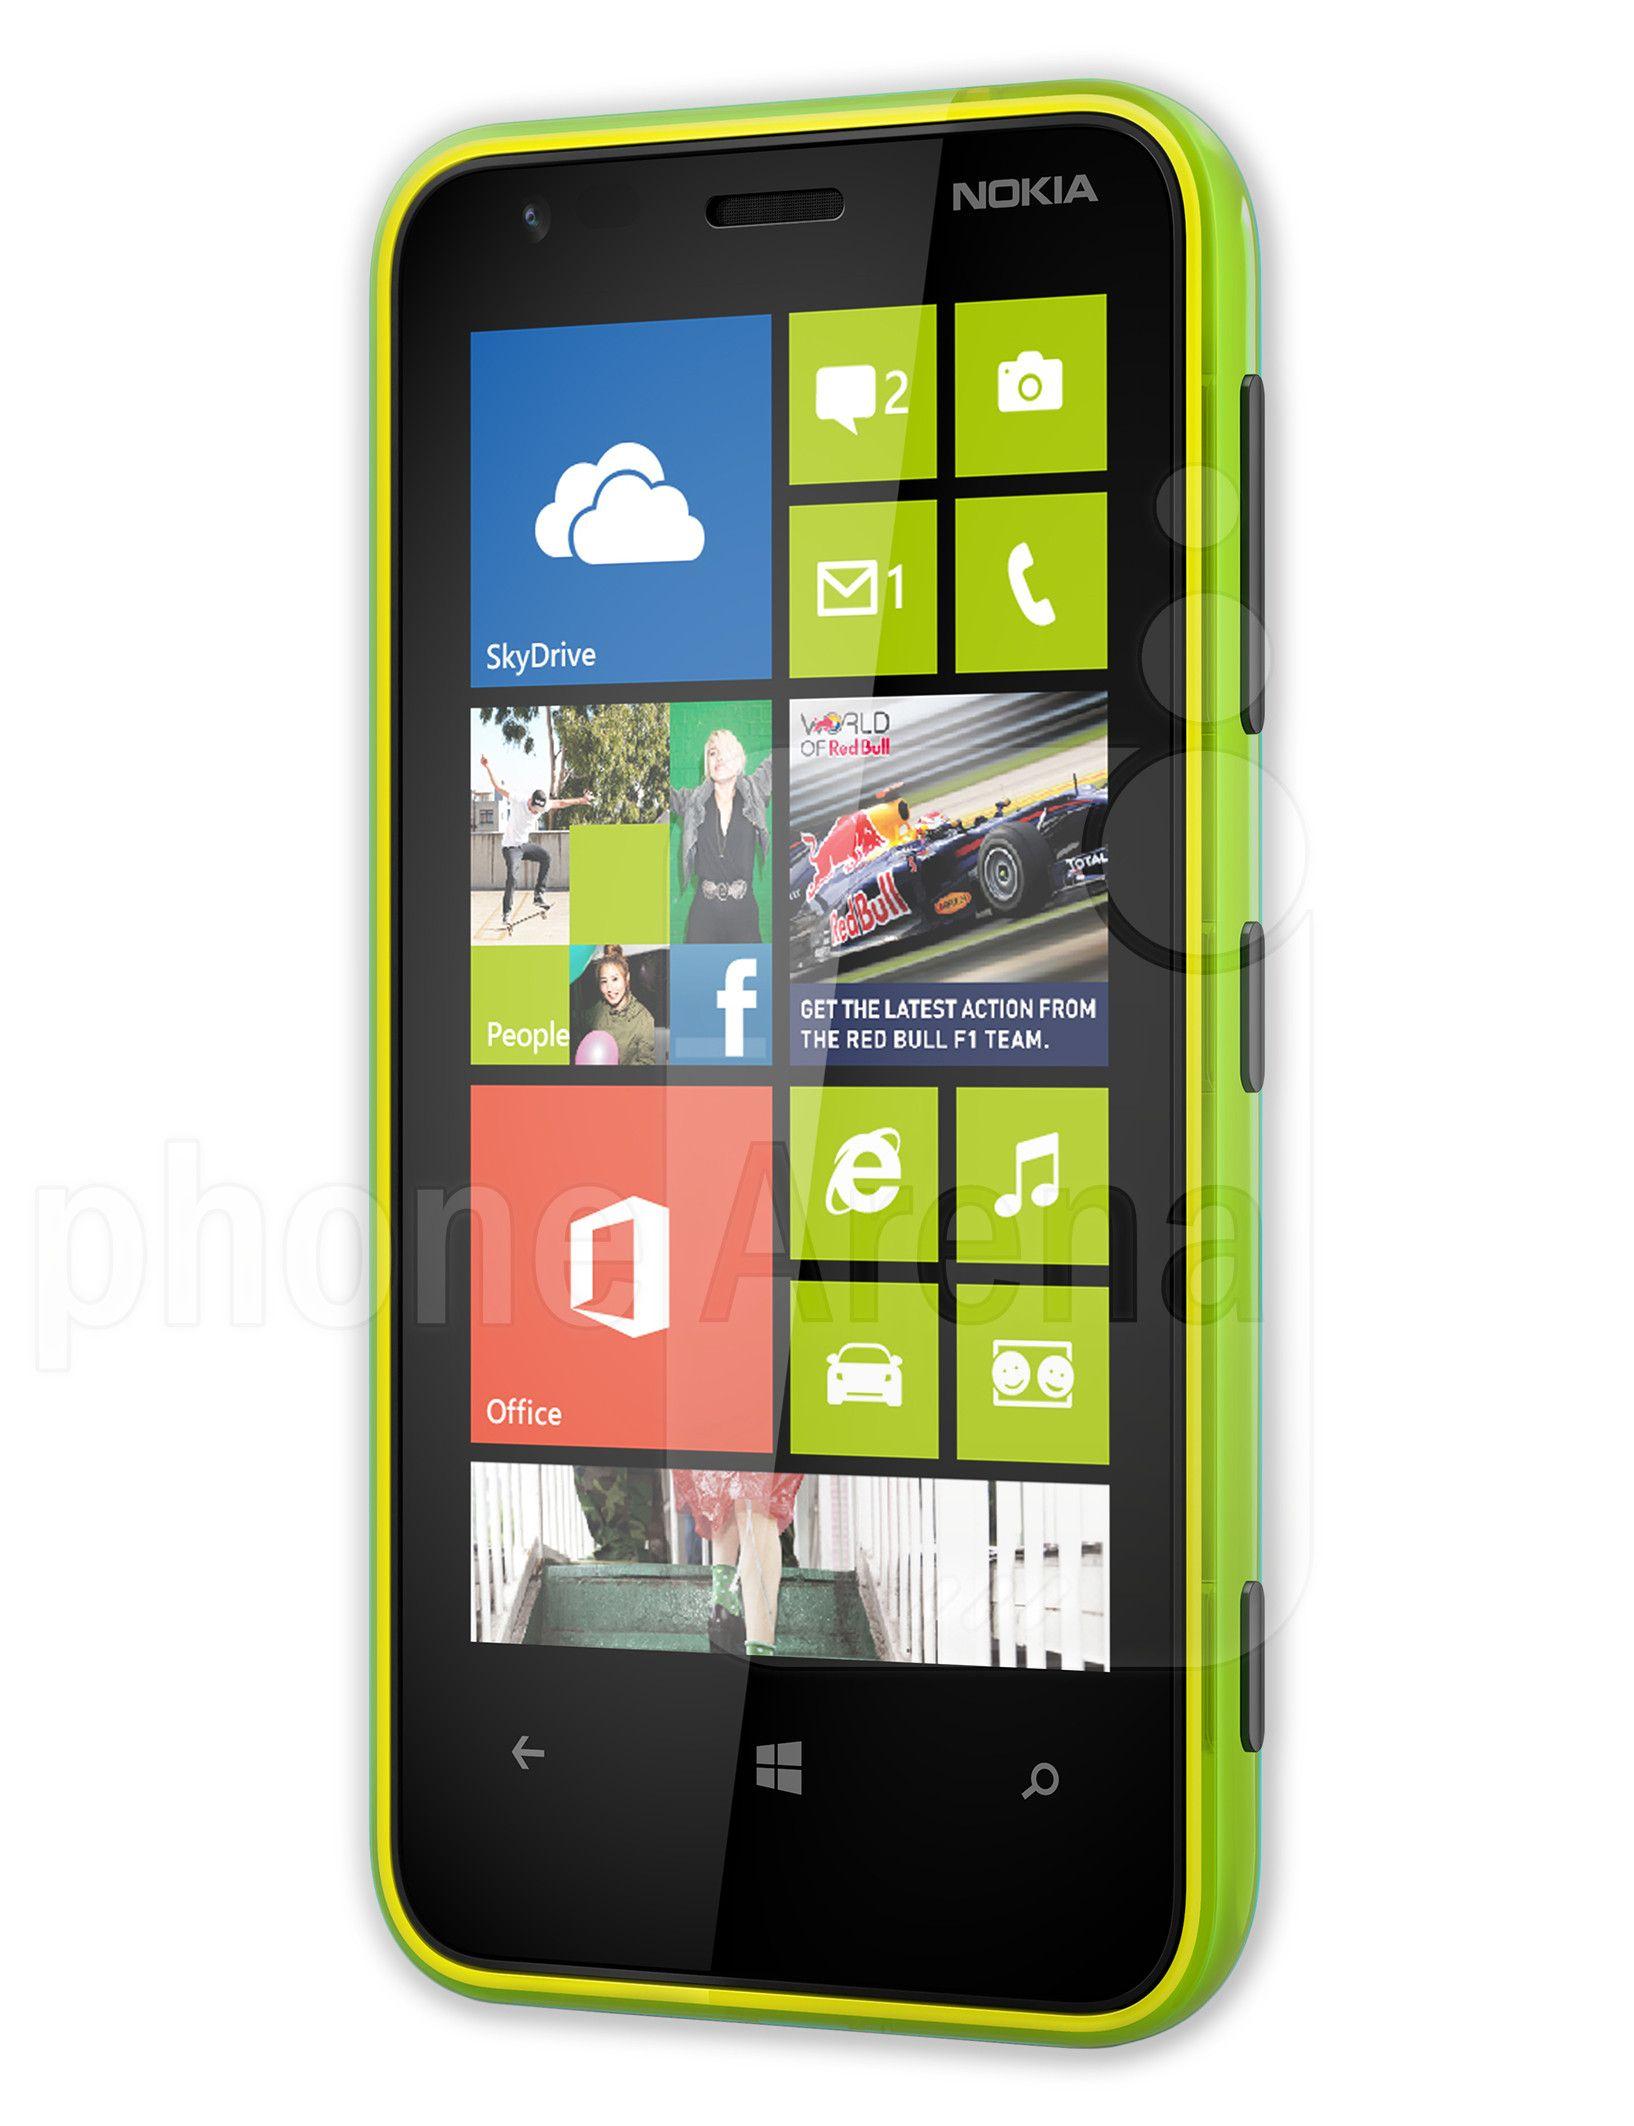 samsung windows phone at lowest price